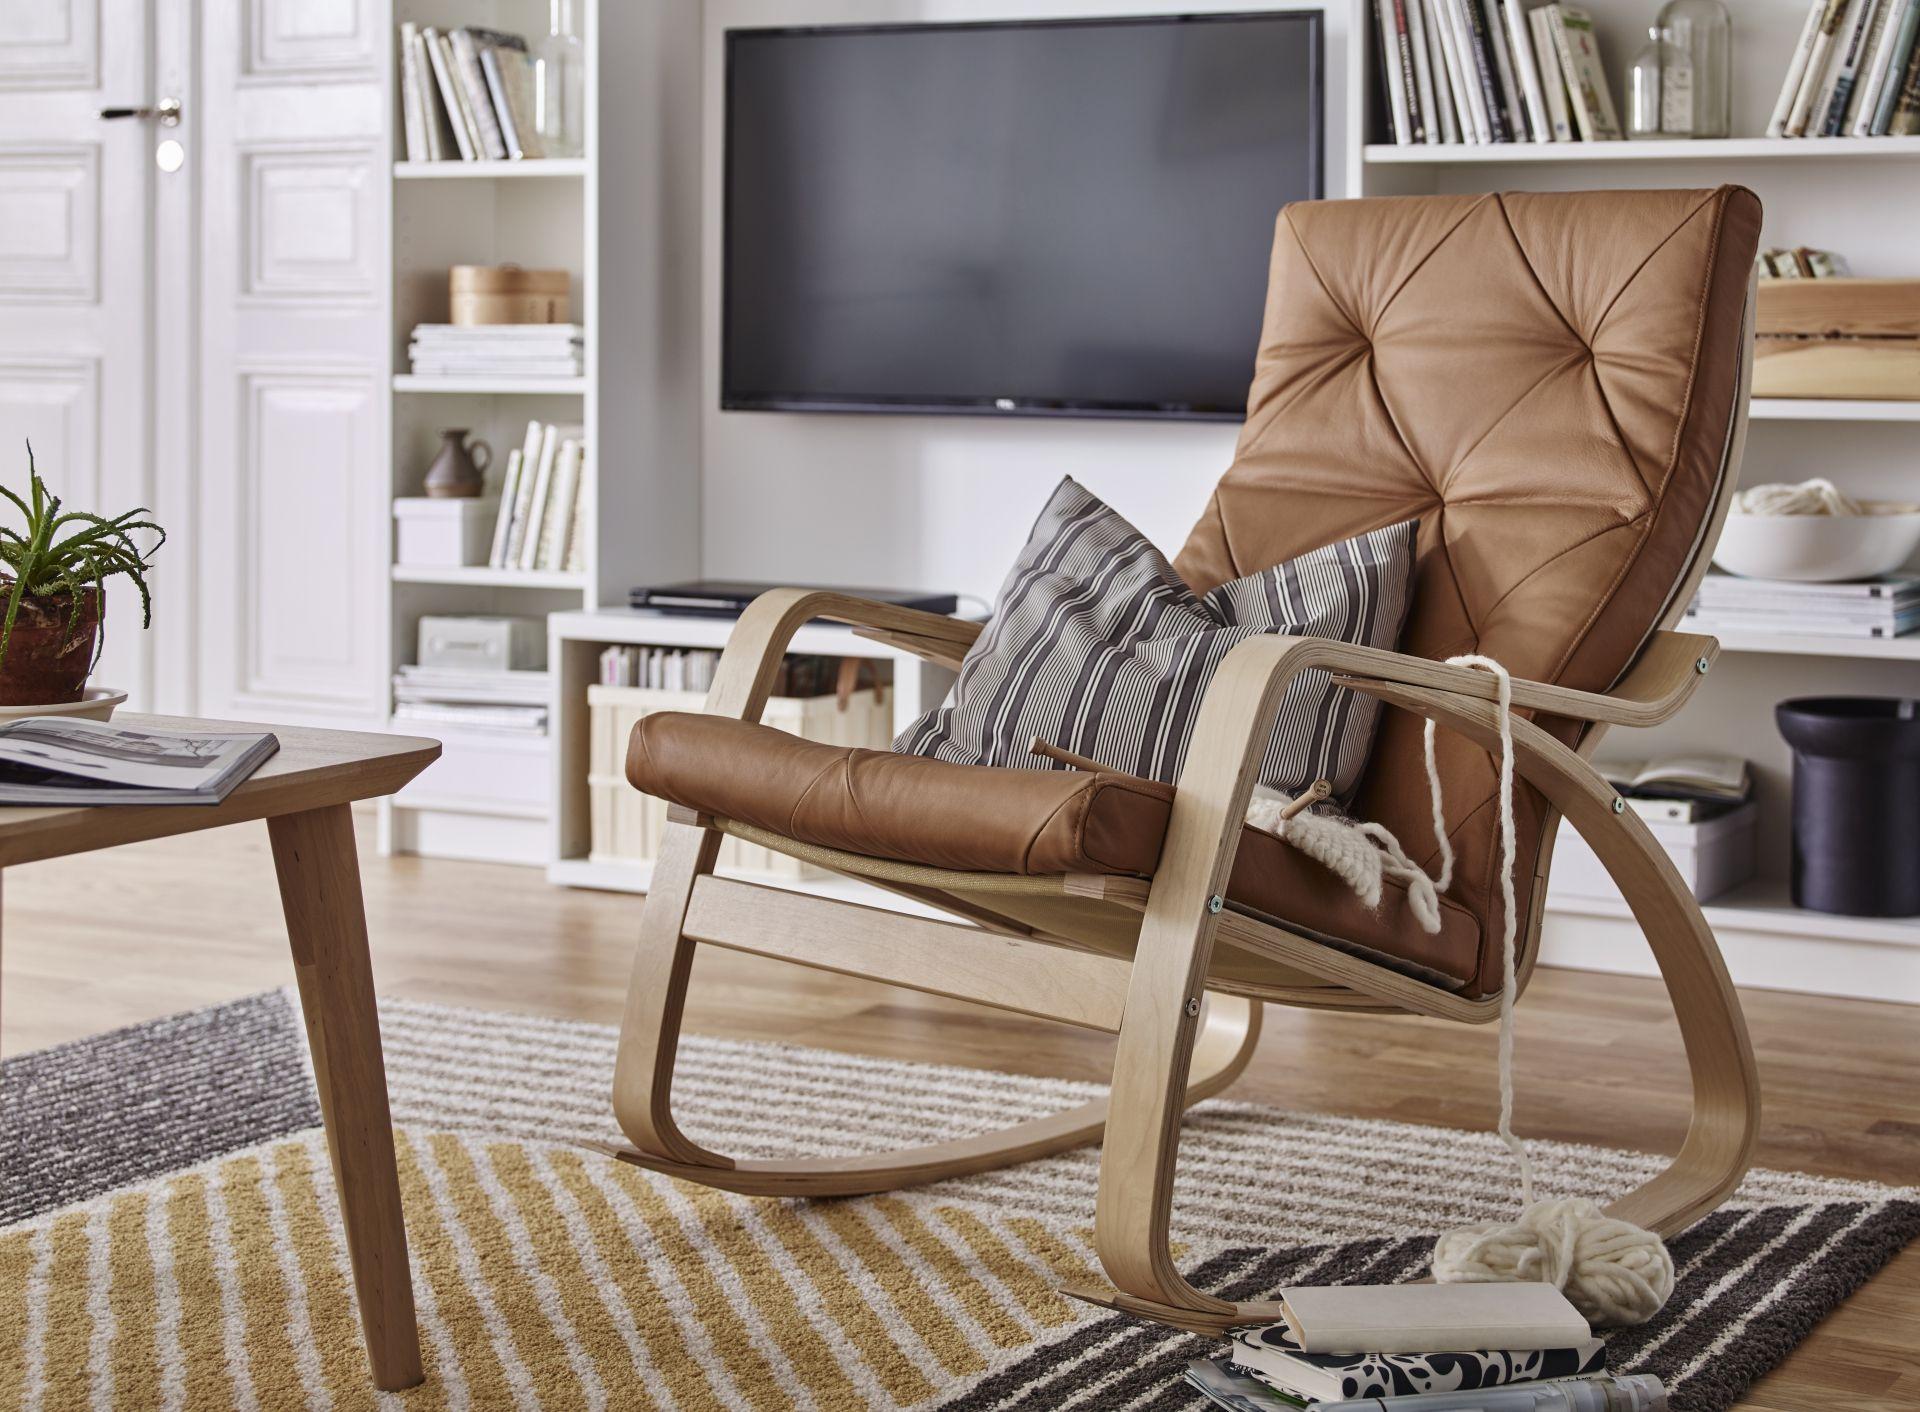 POÄNG schommelstoel   #IKEAcatalogus #nieuw #2017 #IKEA #IKEAnl ...